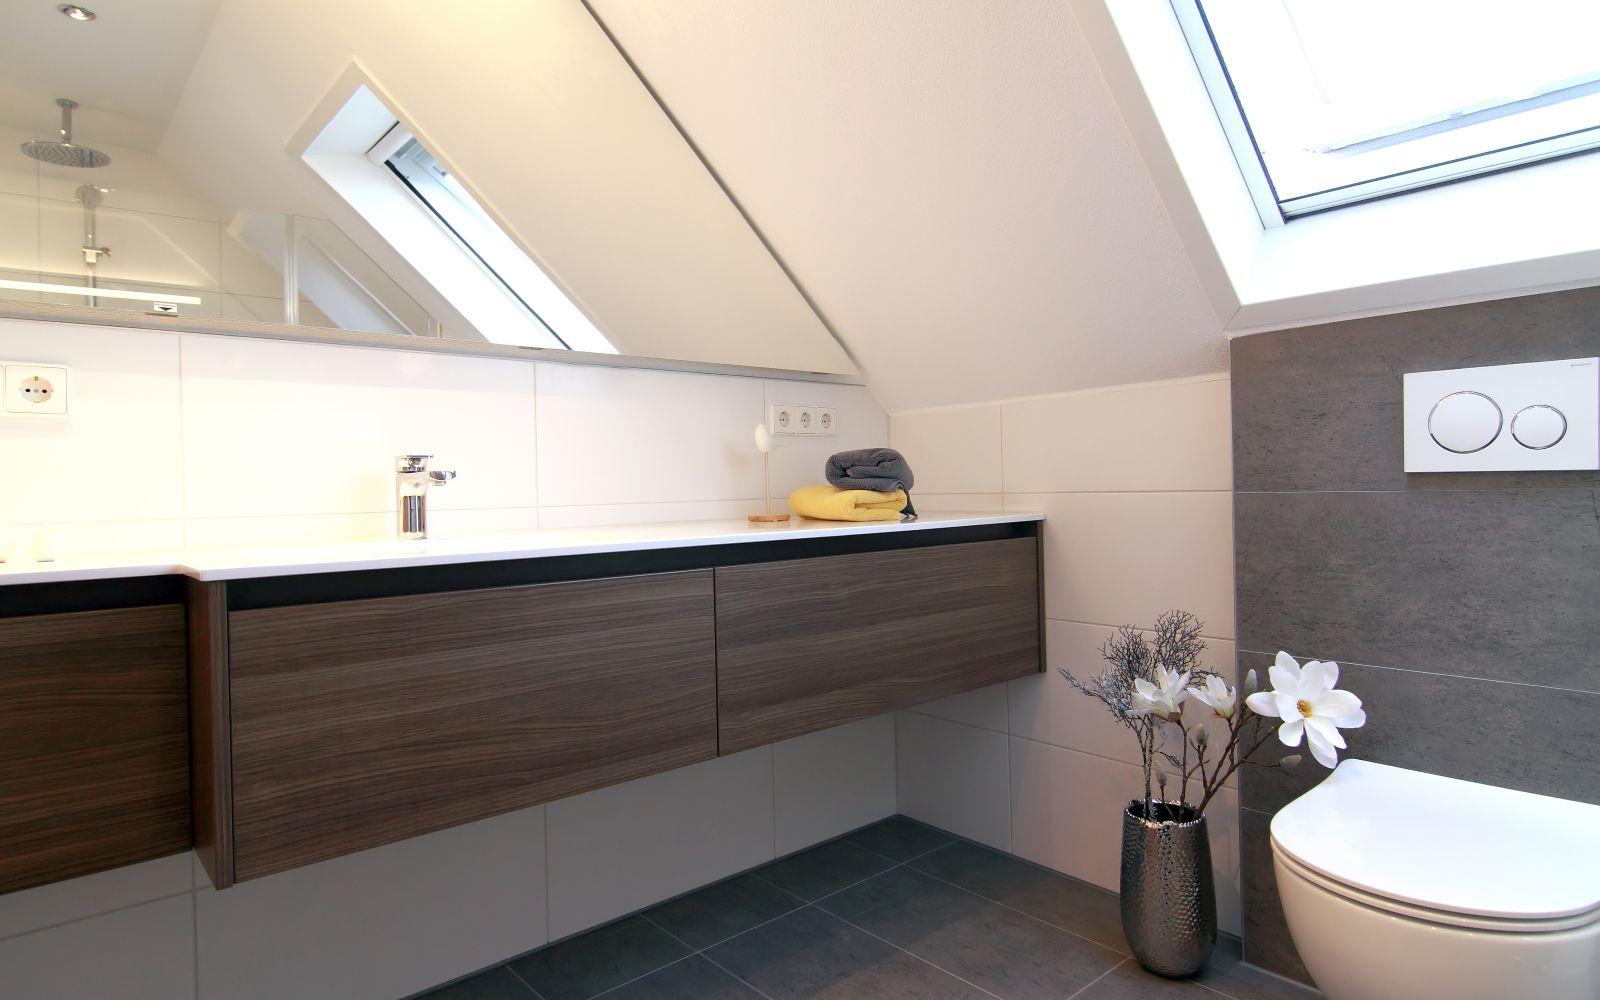 referenzen-badezimmer/altersgerechtes-bad-im-dachgeschoss | Stübler ...